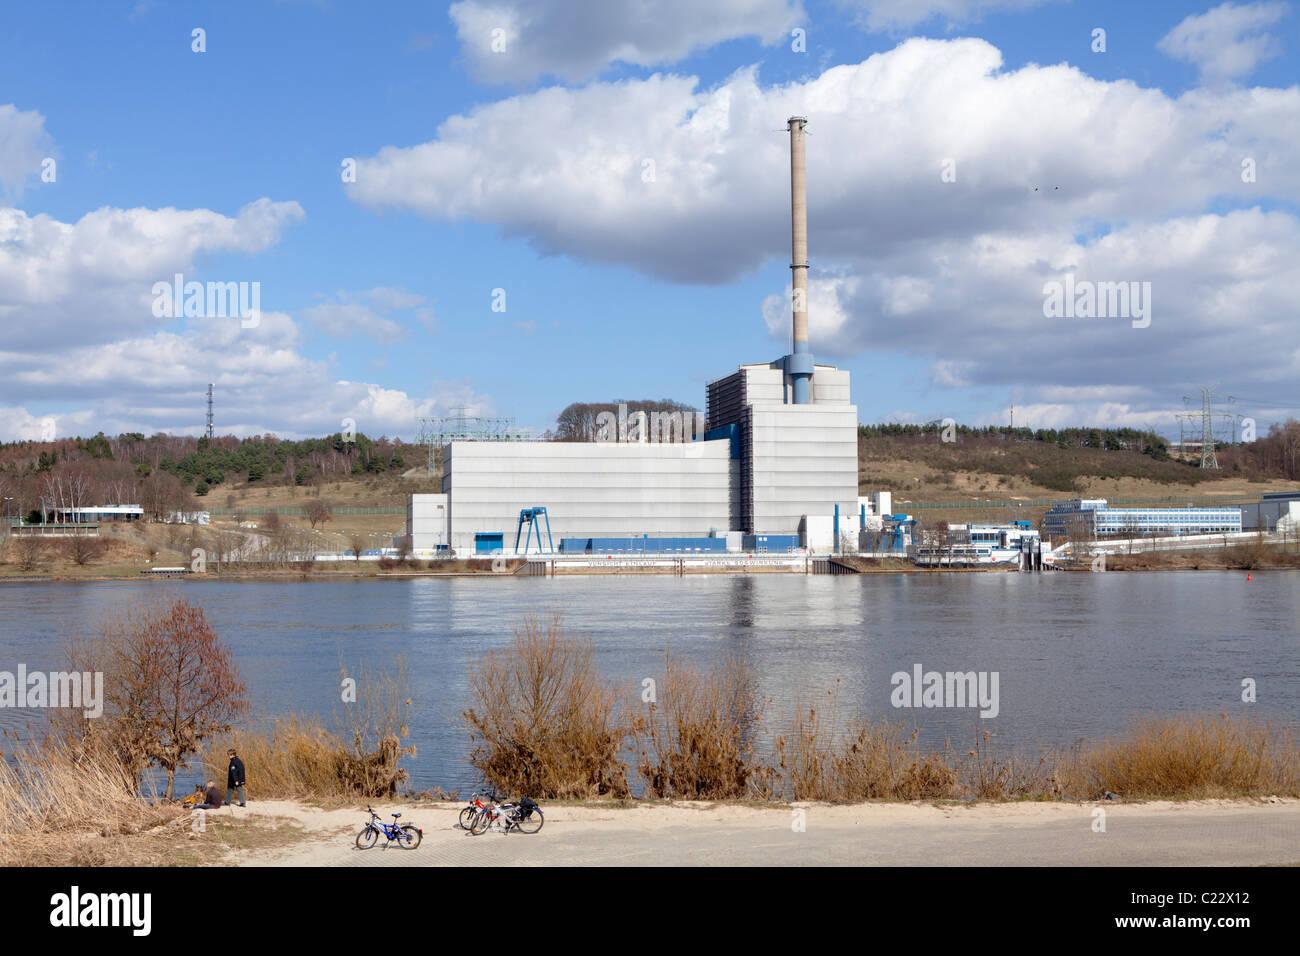 nuclear power station Kruemmel near Geesthacht, Schleswig-Holstein, Germany Stock Photo